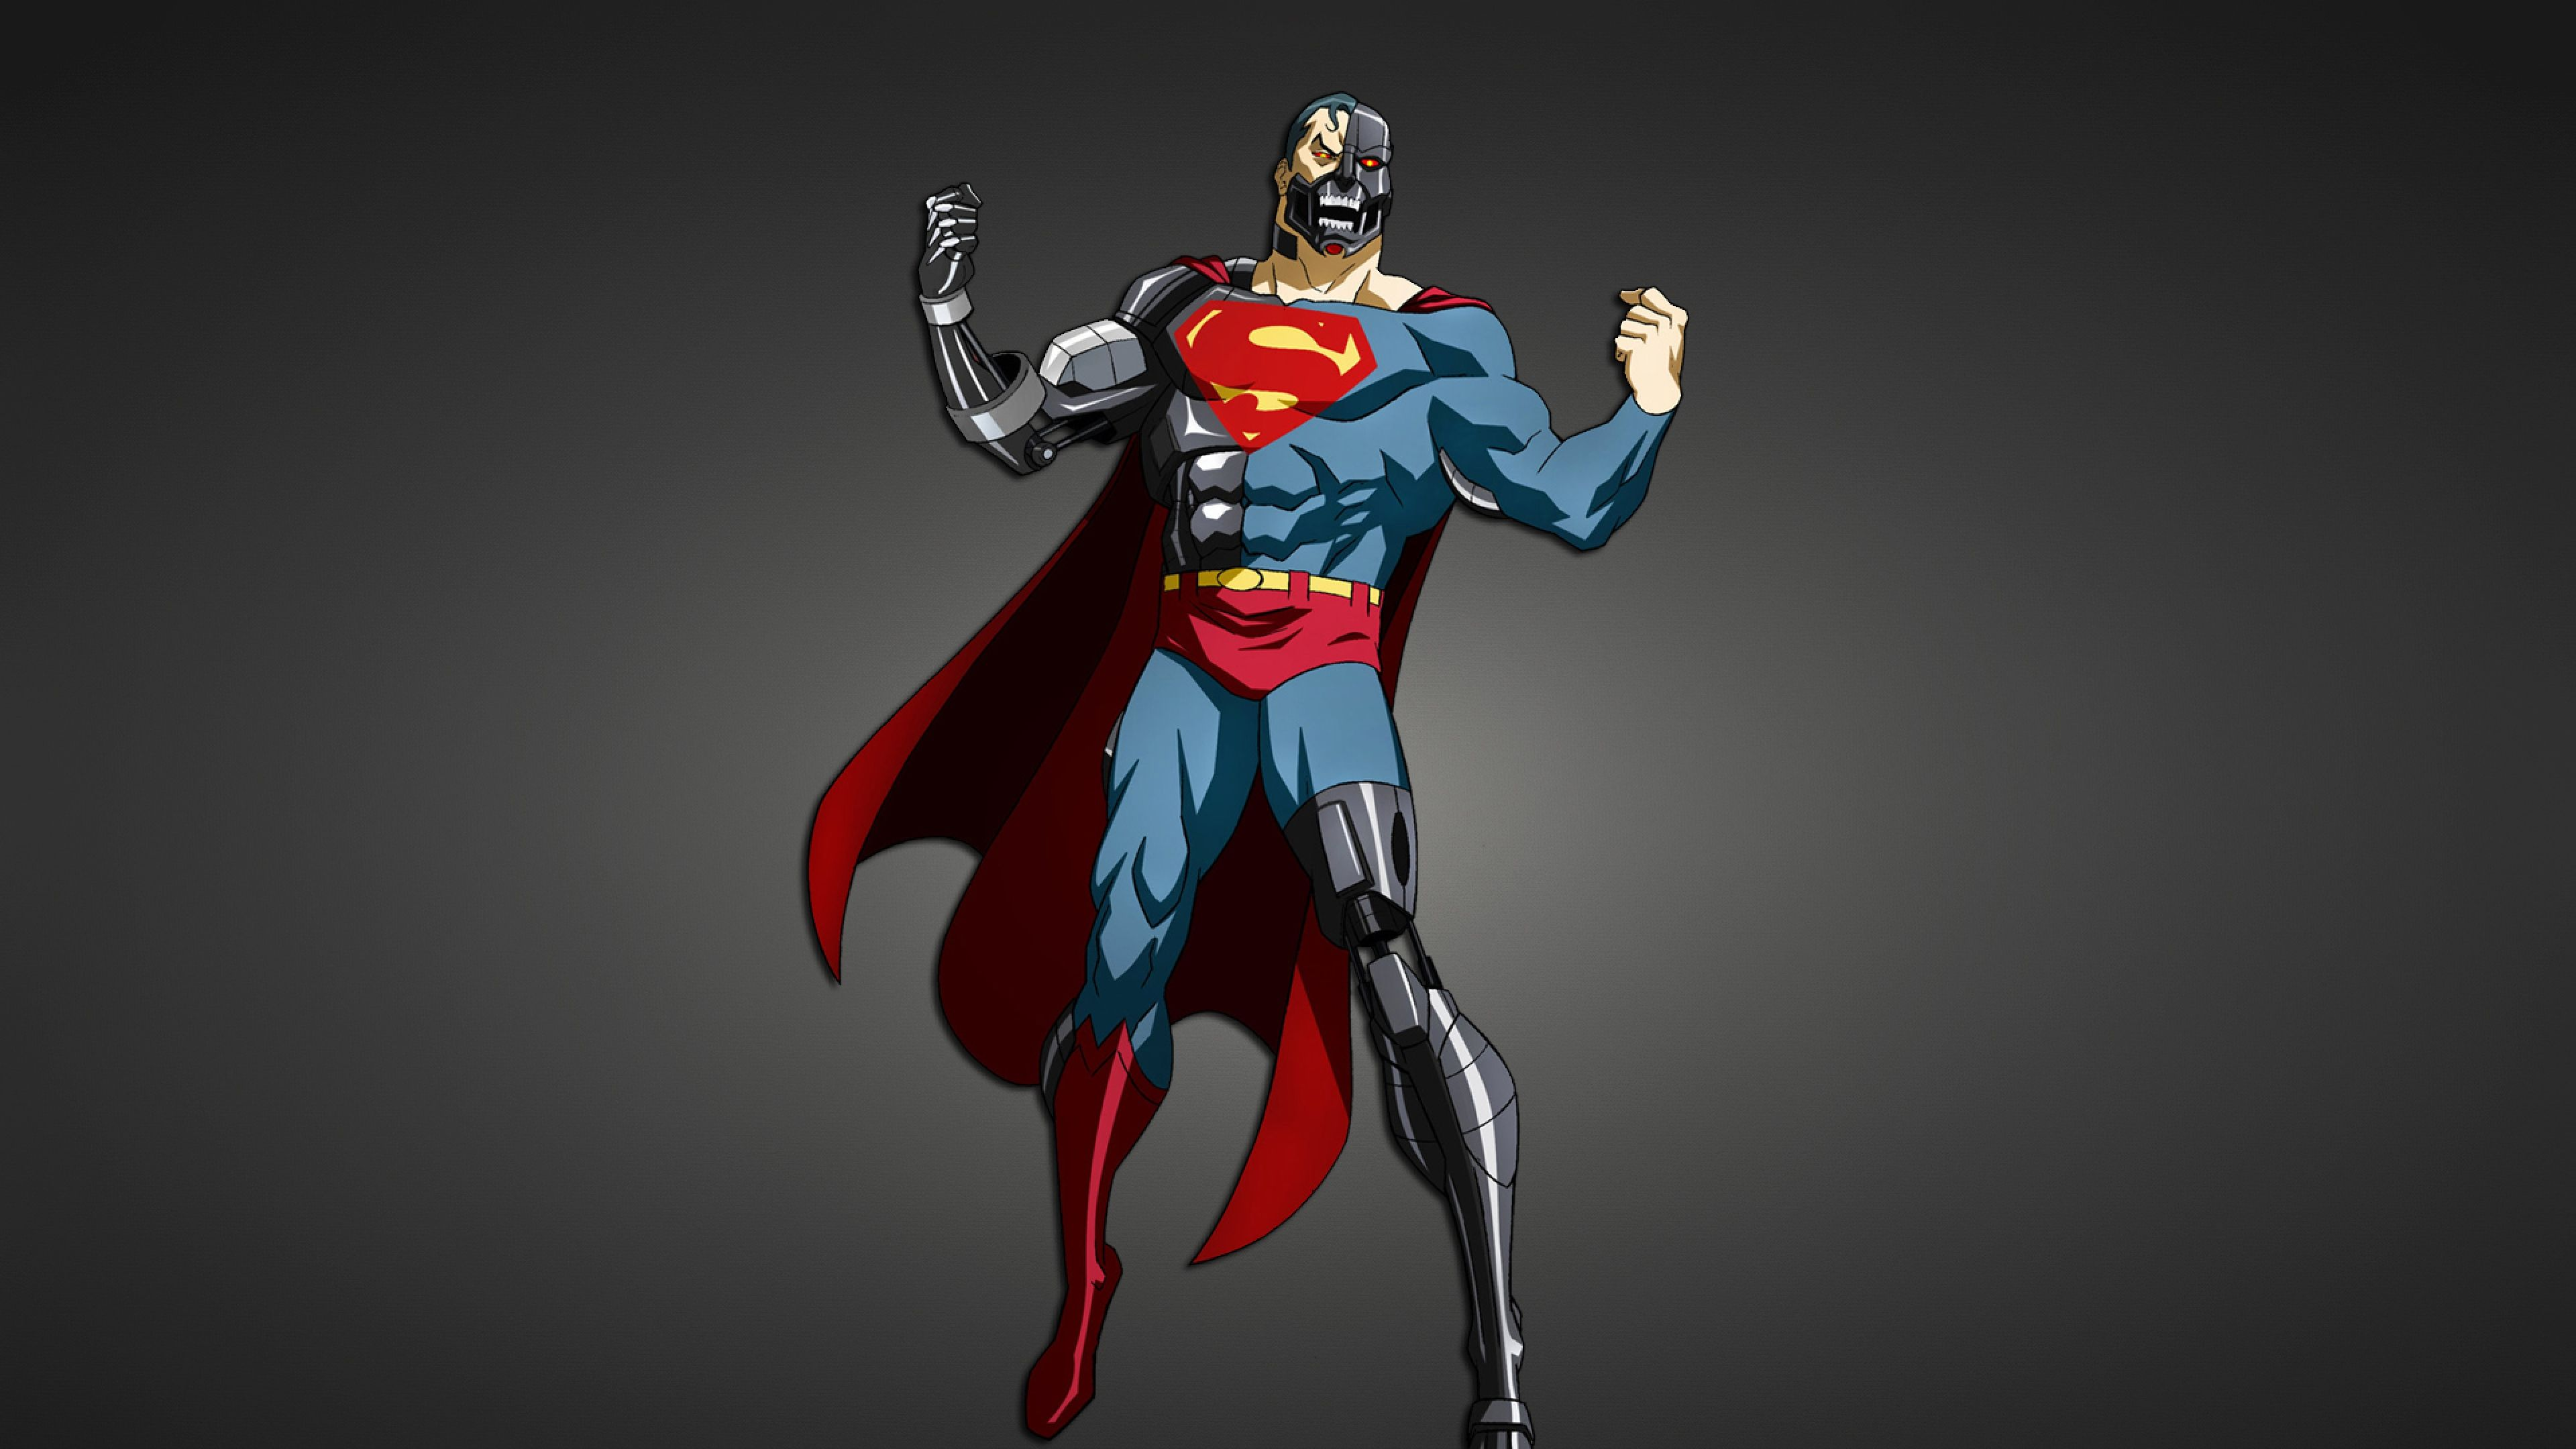 Super Heroes 4K Computer Wallpapers - Top Free Super ...